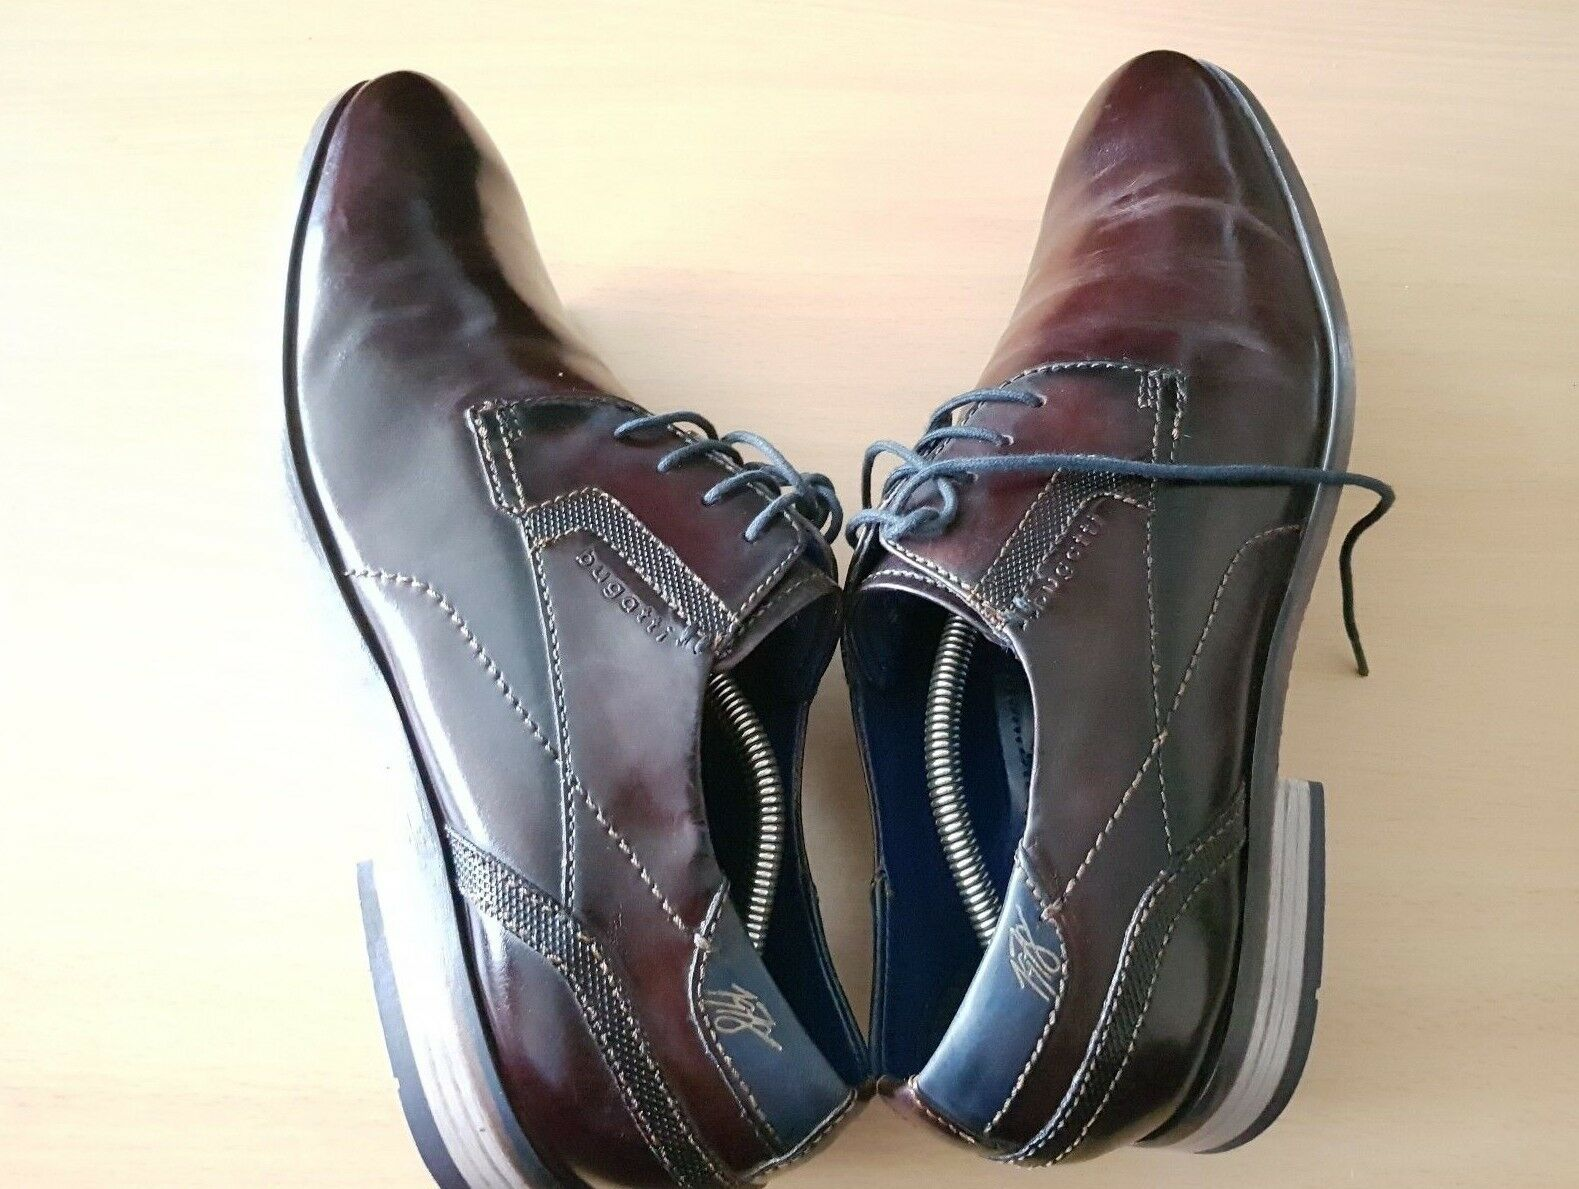 Bugatti Herren Echtleder Halbschuhe Business Schuhe Schnürer gr 45